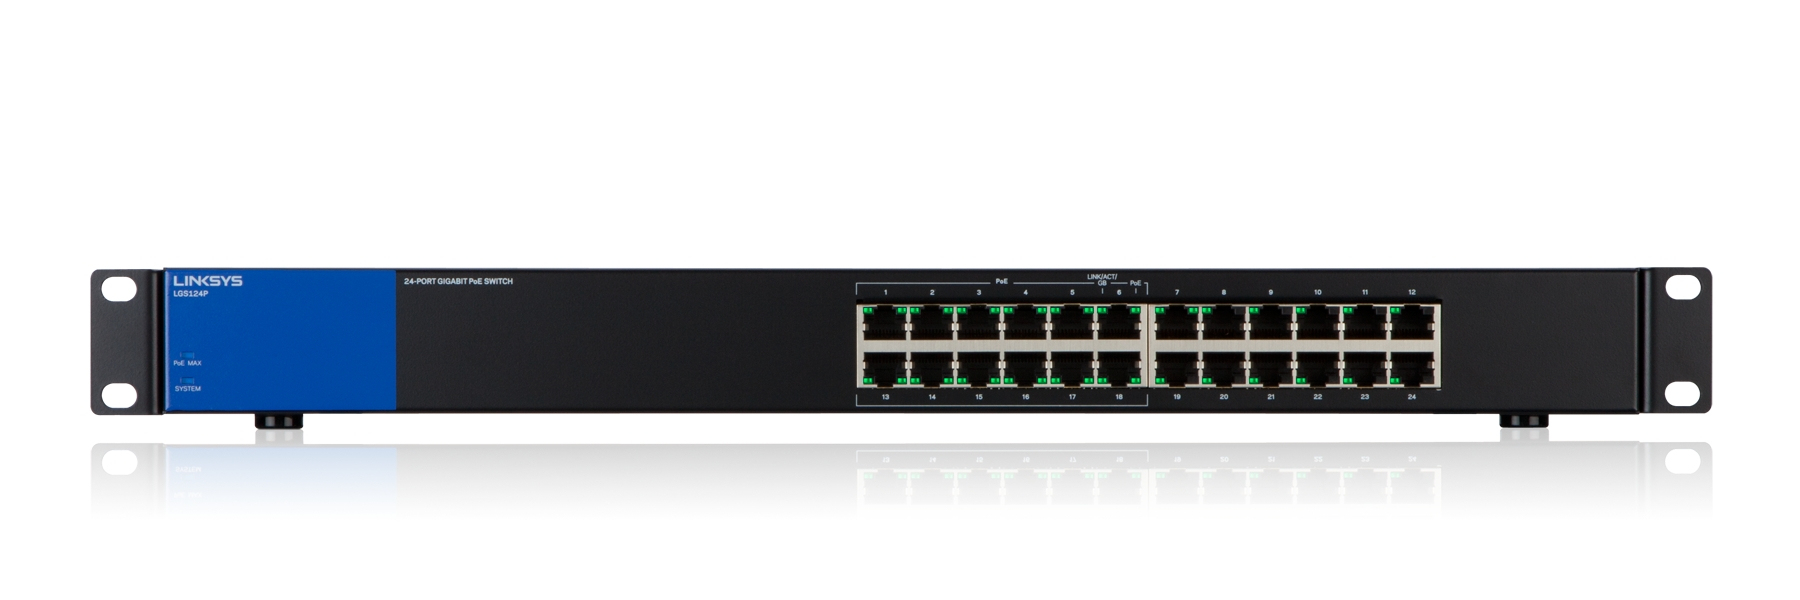 LGS124P Switch (unmanaged, 12 x 10/100/1000 poorten PoE + 12 x 10/100/1000 poorten, rack-mountable, PoE+)